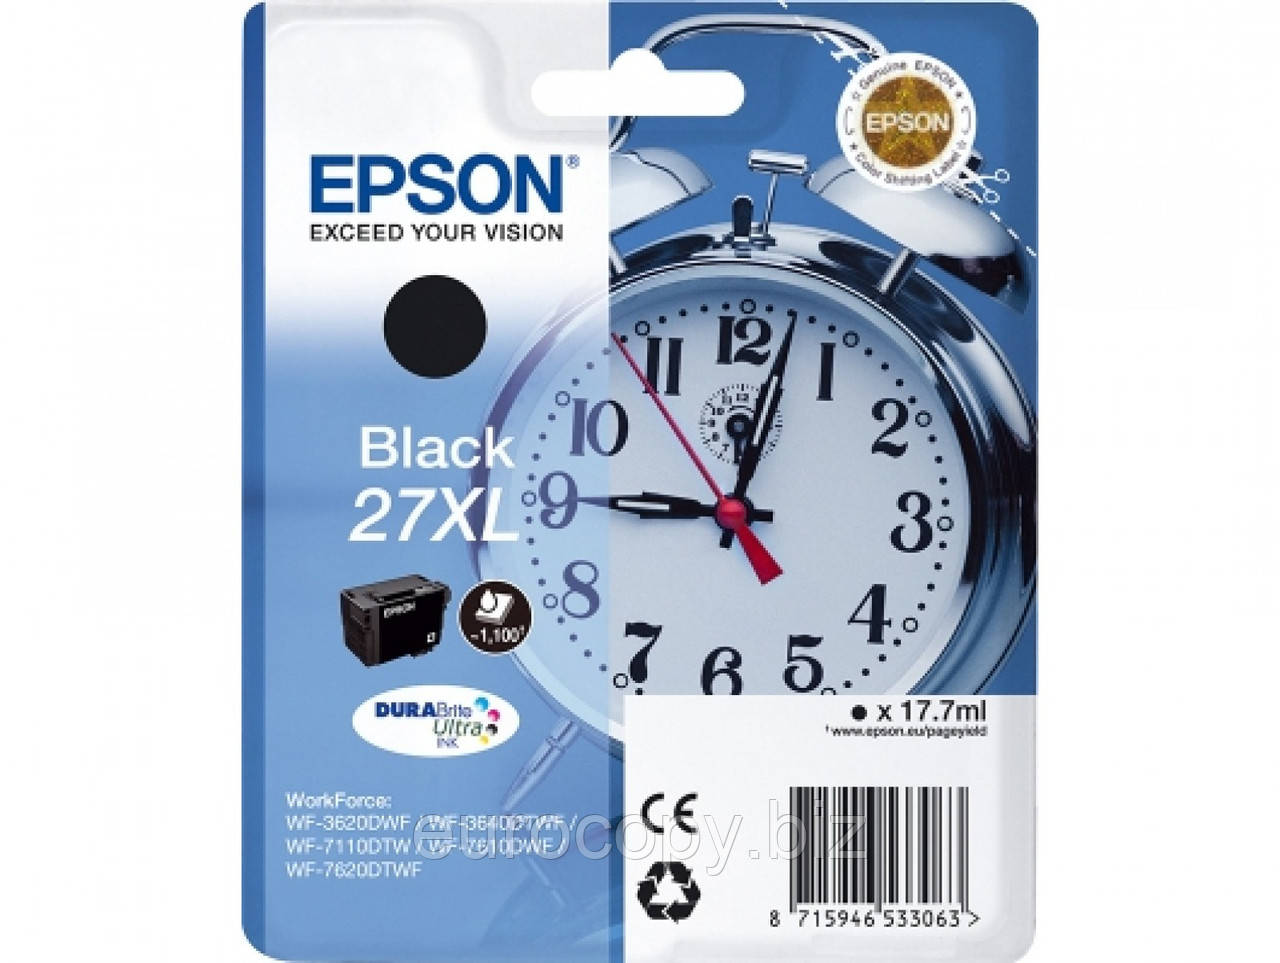 Чорнила Epson для WF7110 XL Black (C13T27114022)